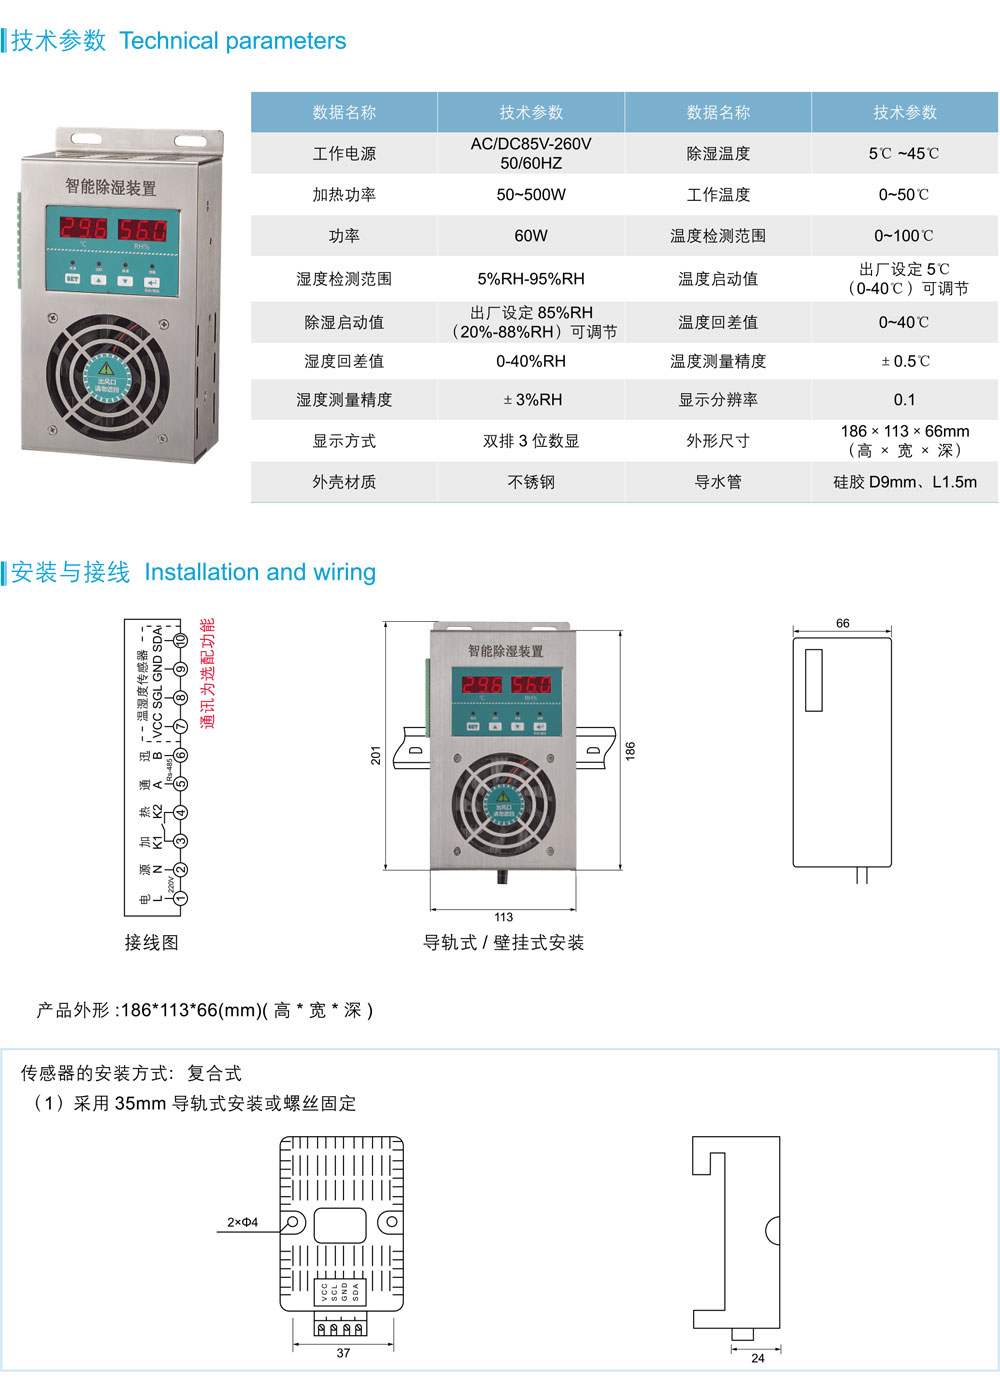 HXDZ-CS60X 不銹鋼型智能除濕裝置詳情.jpg